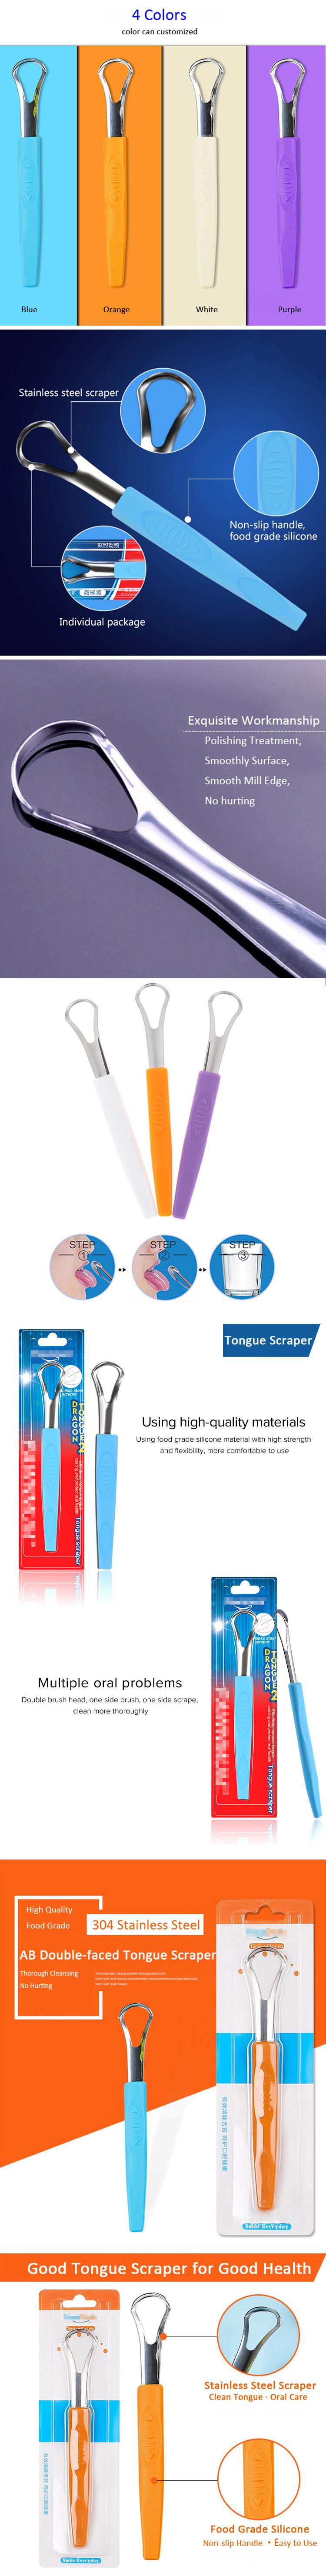 La lengua de acero inoxidable raspador limpiador aliento fresco de lengua de grado médico de la lengua raspado limpiador